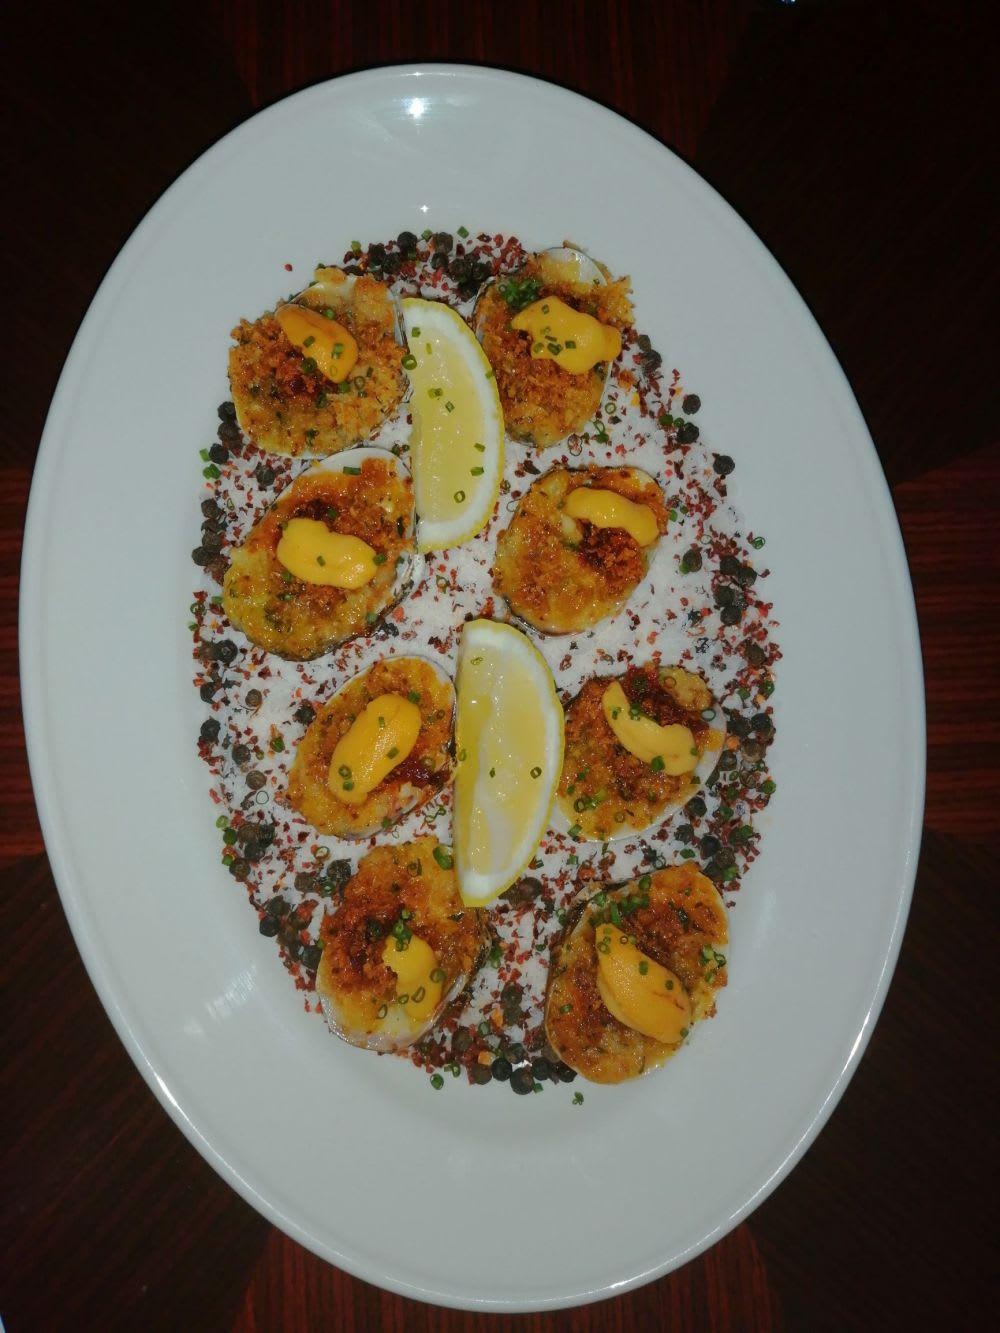 Baked cherrystone clams